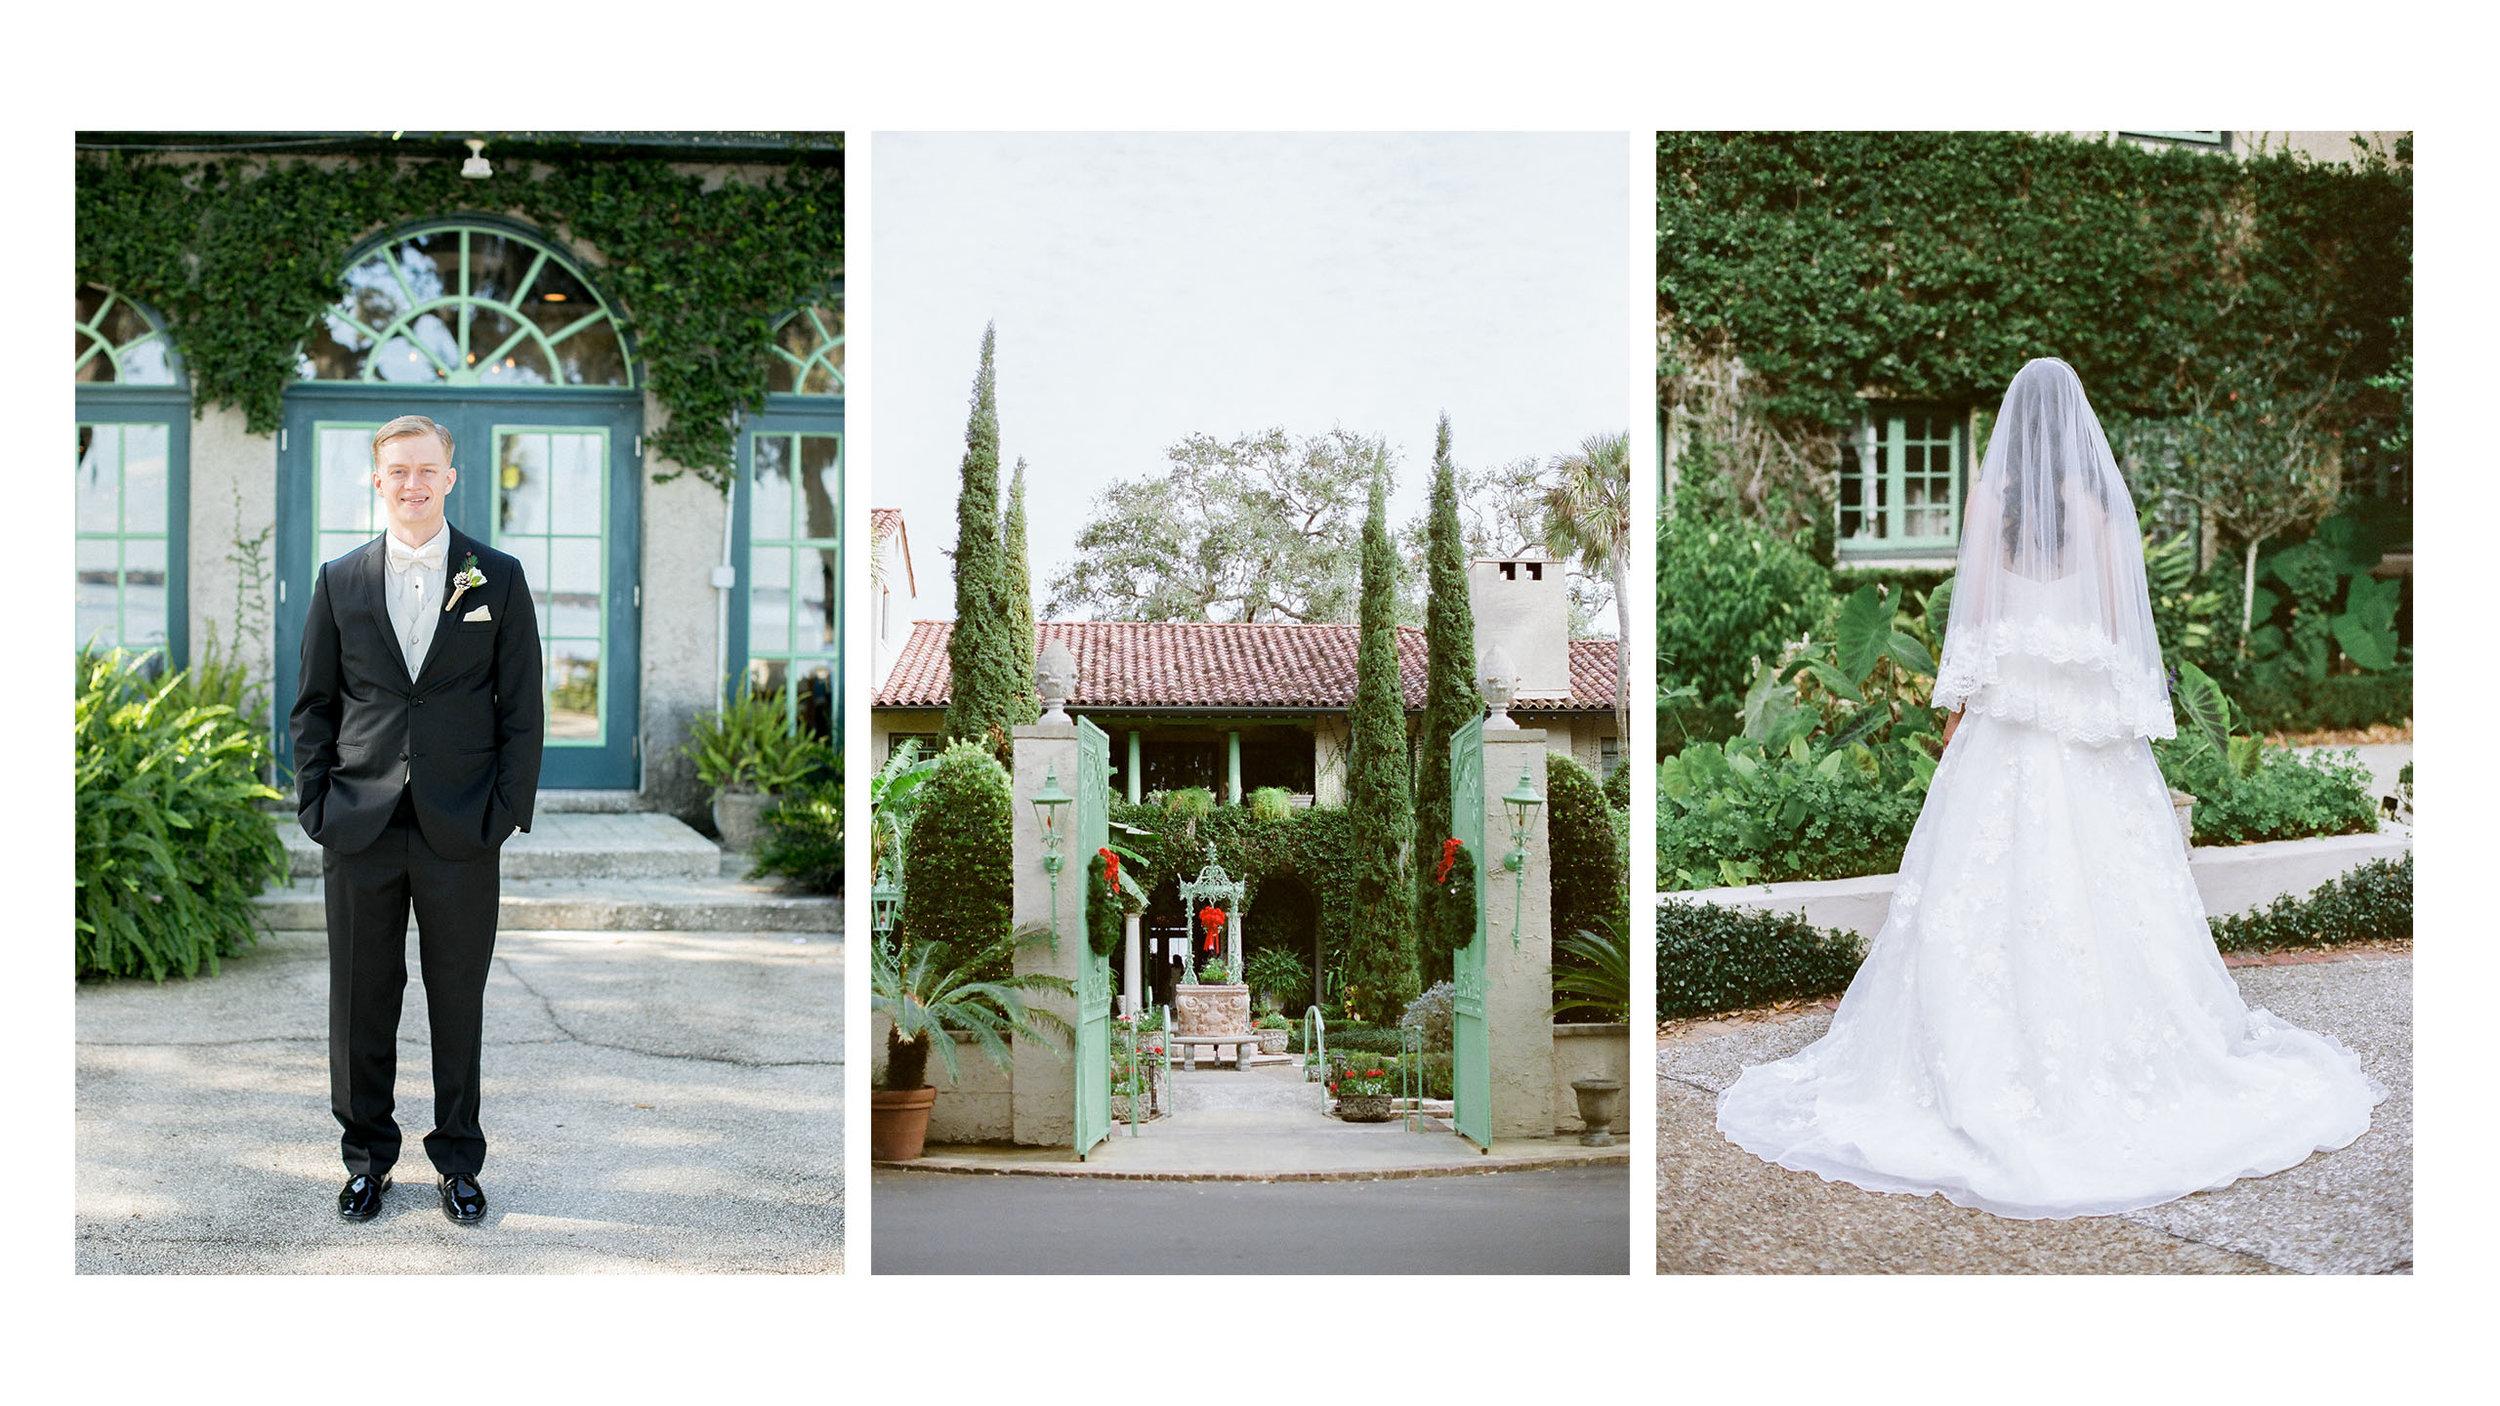 sauphia-germain-wedding-photographer.jpg